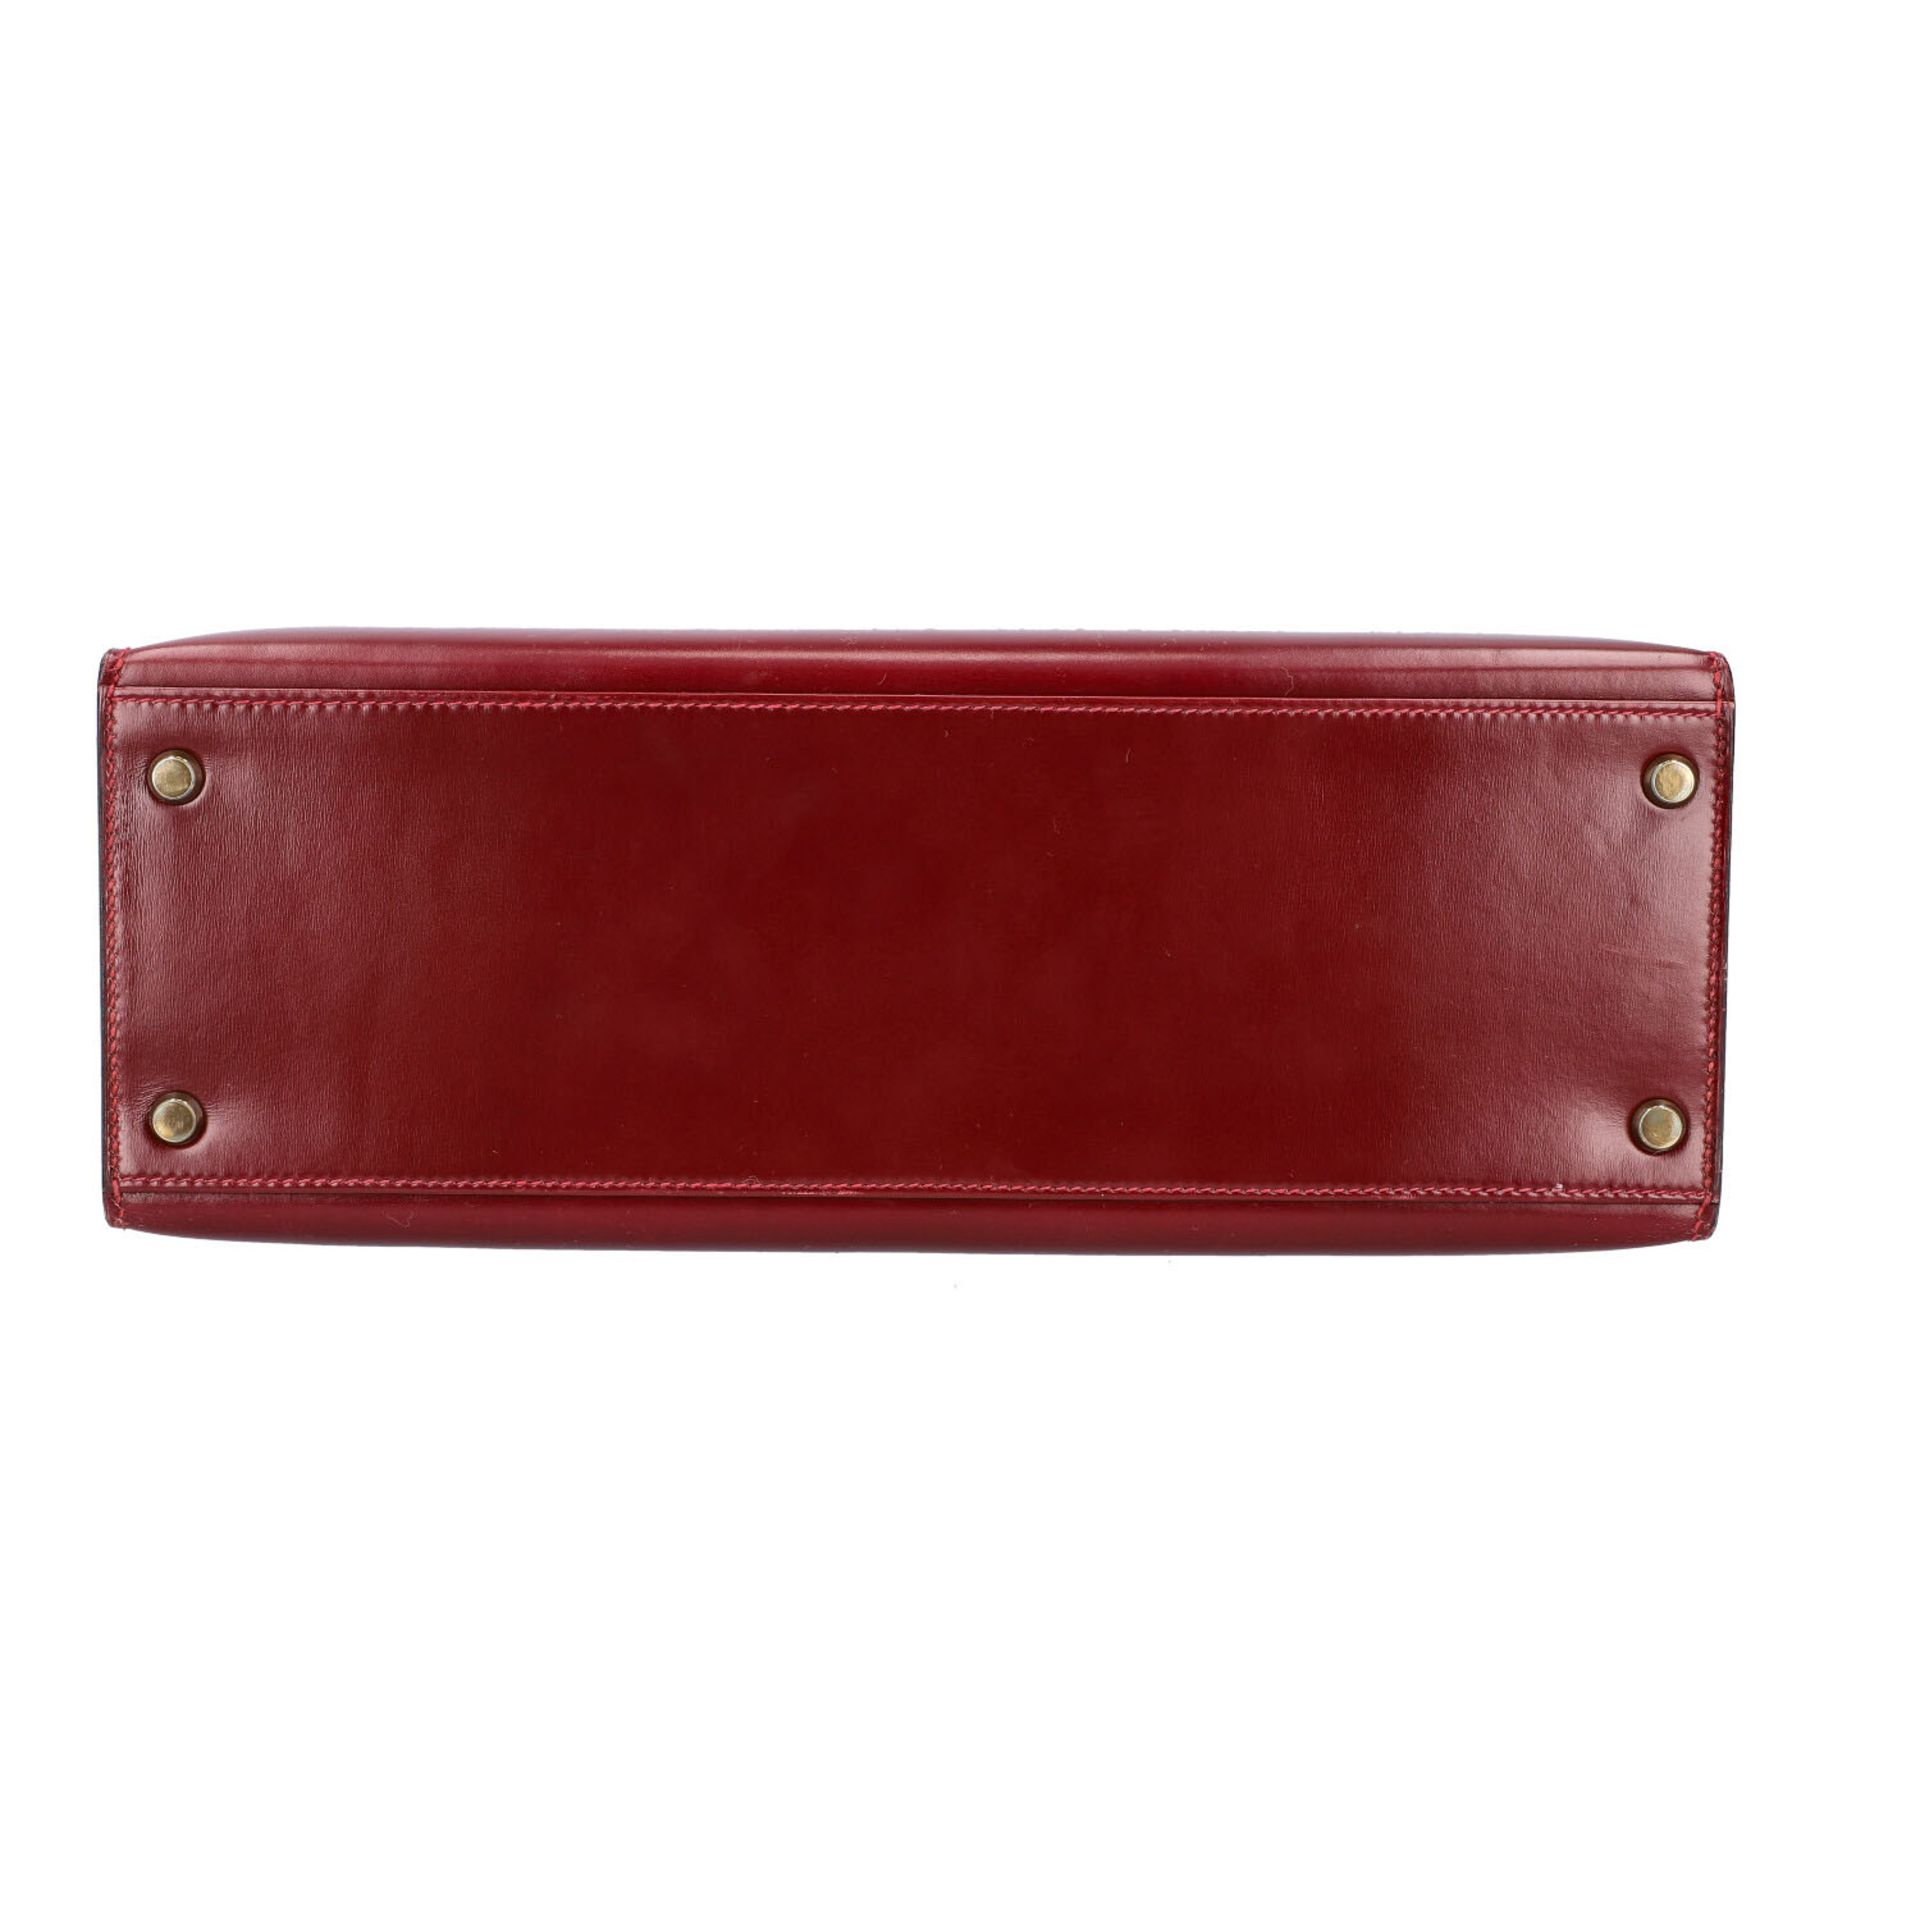 "HERMÈS VINTAGE Handtasche ""KELLY BAG 32"". Koll. 1980. NP. ca.: 8.000,-€. Boxcalf Le - Image 5 of 9"